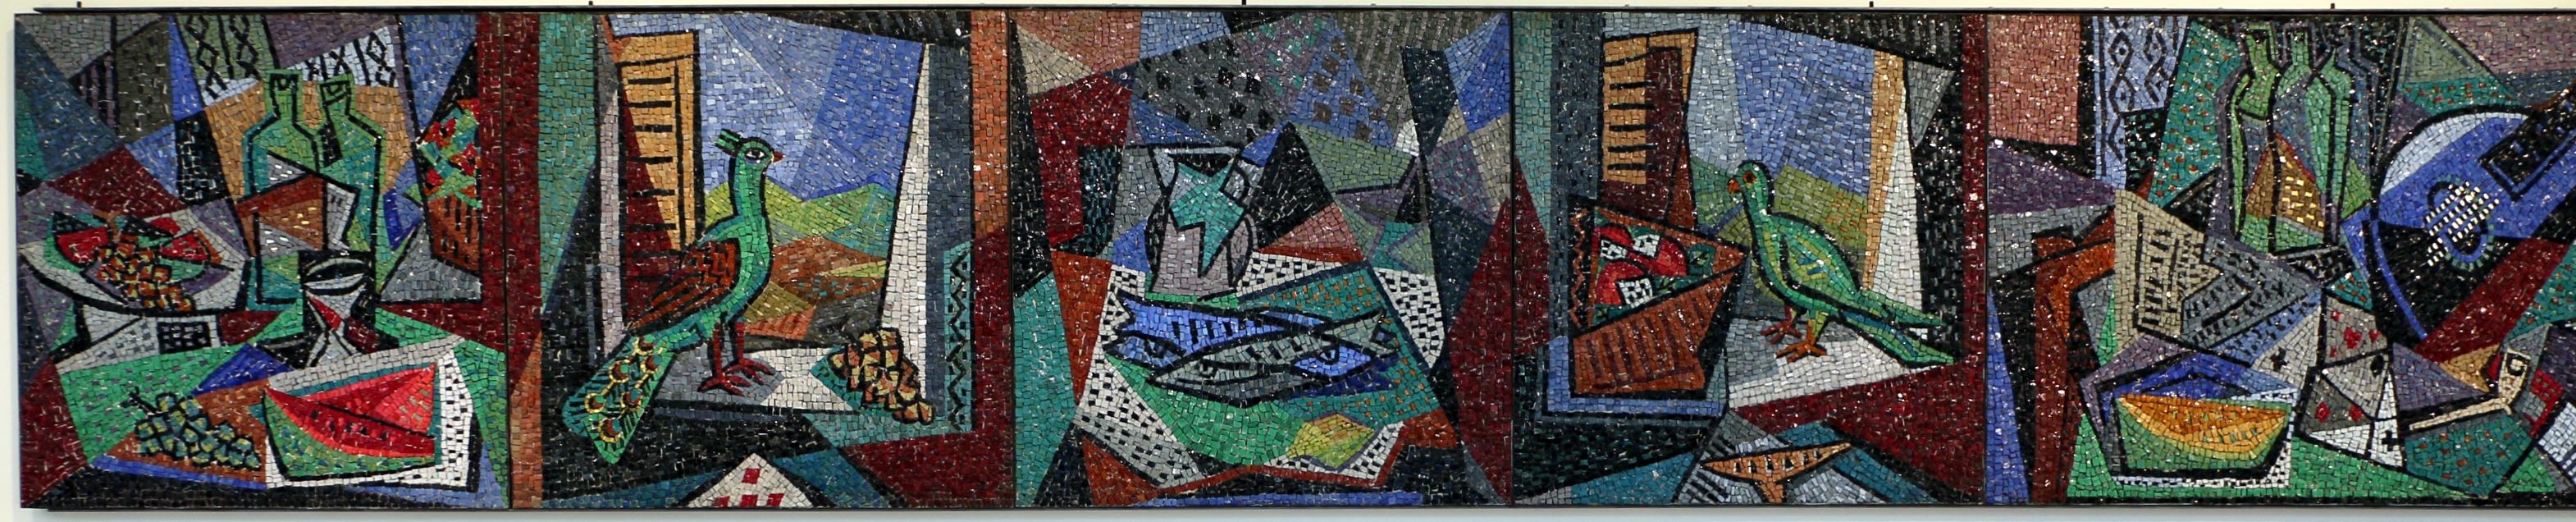 Lino melano, senza titolo, 1952, 01 - Sailko - Ravenna (RA)